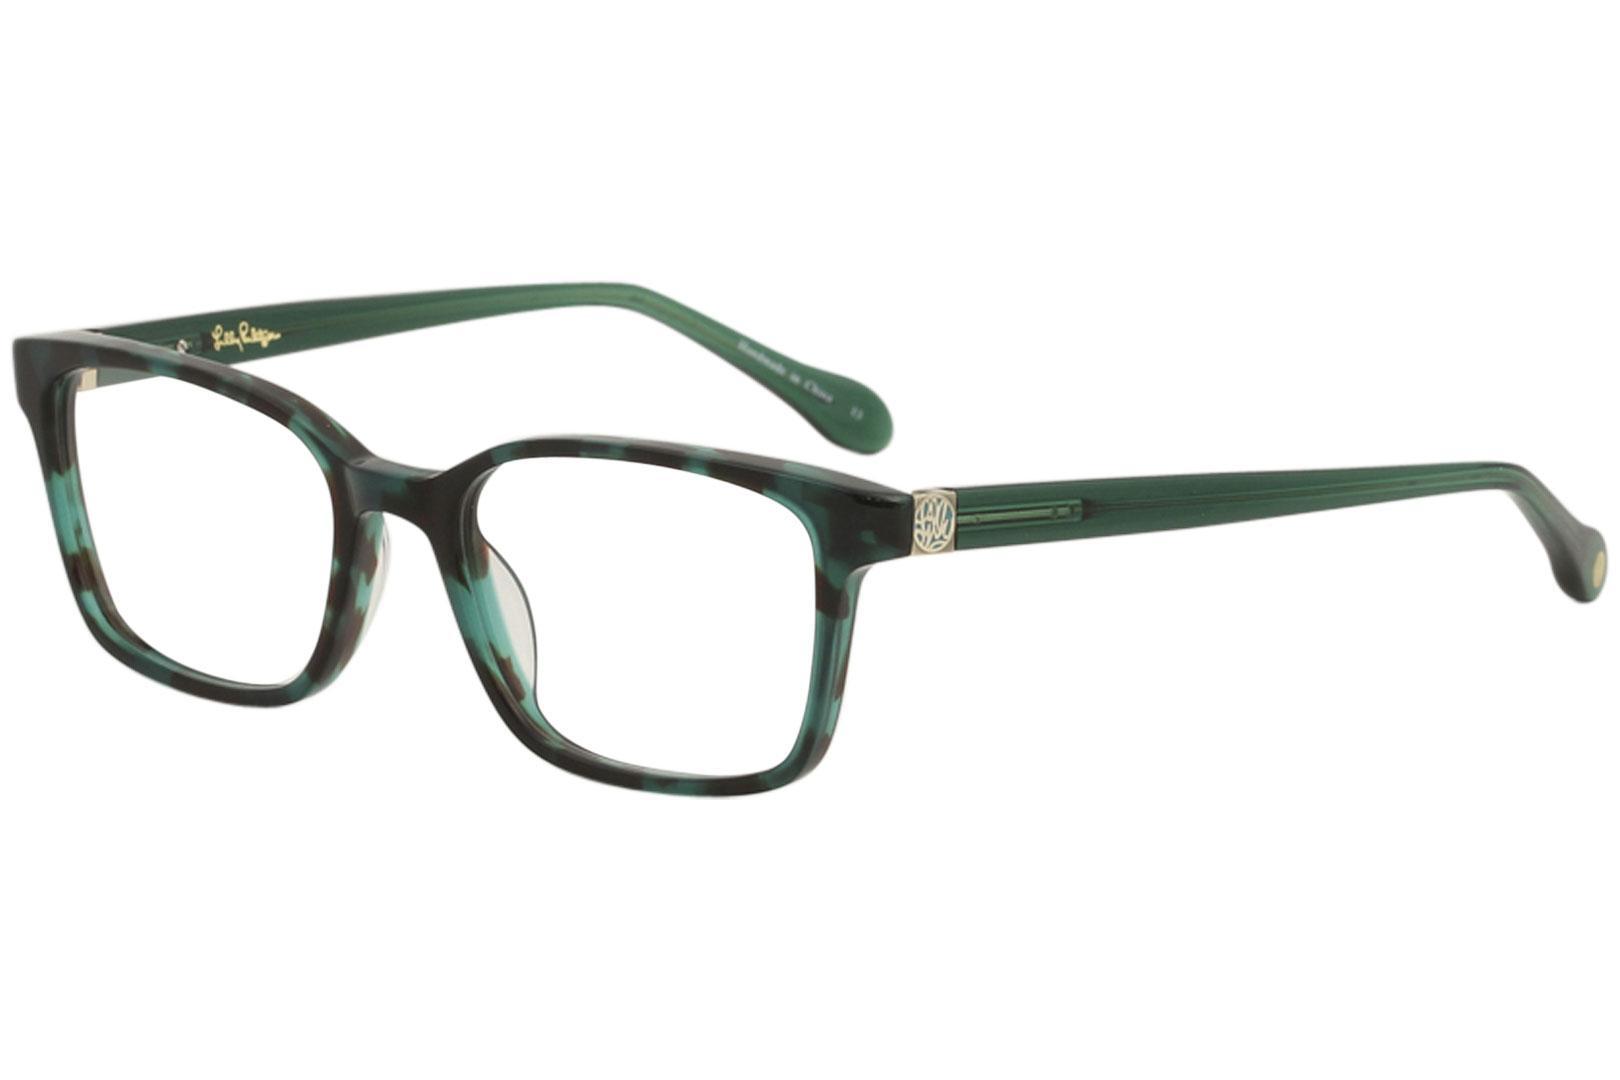 c8e327c16a Lilly Pulitzer Women S Eyeglasses Reagen Full Rim Optical Frame